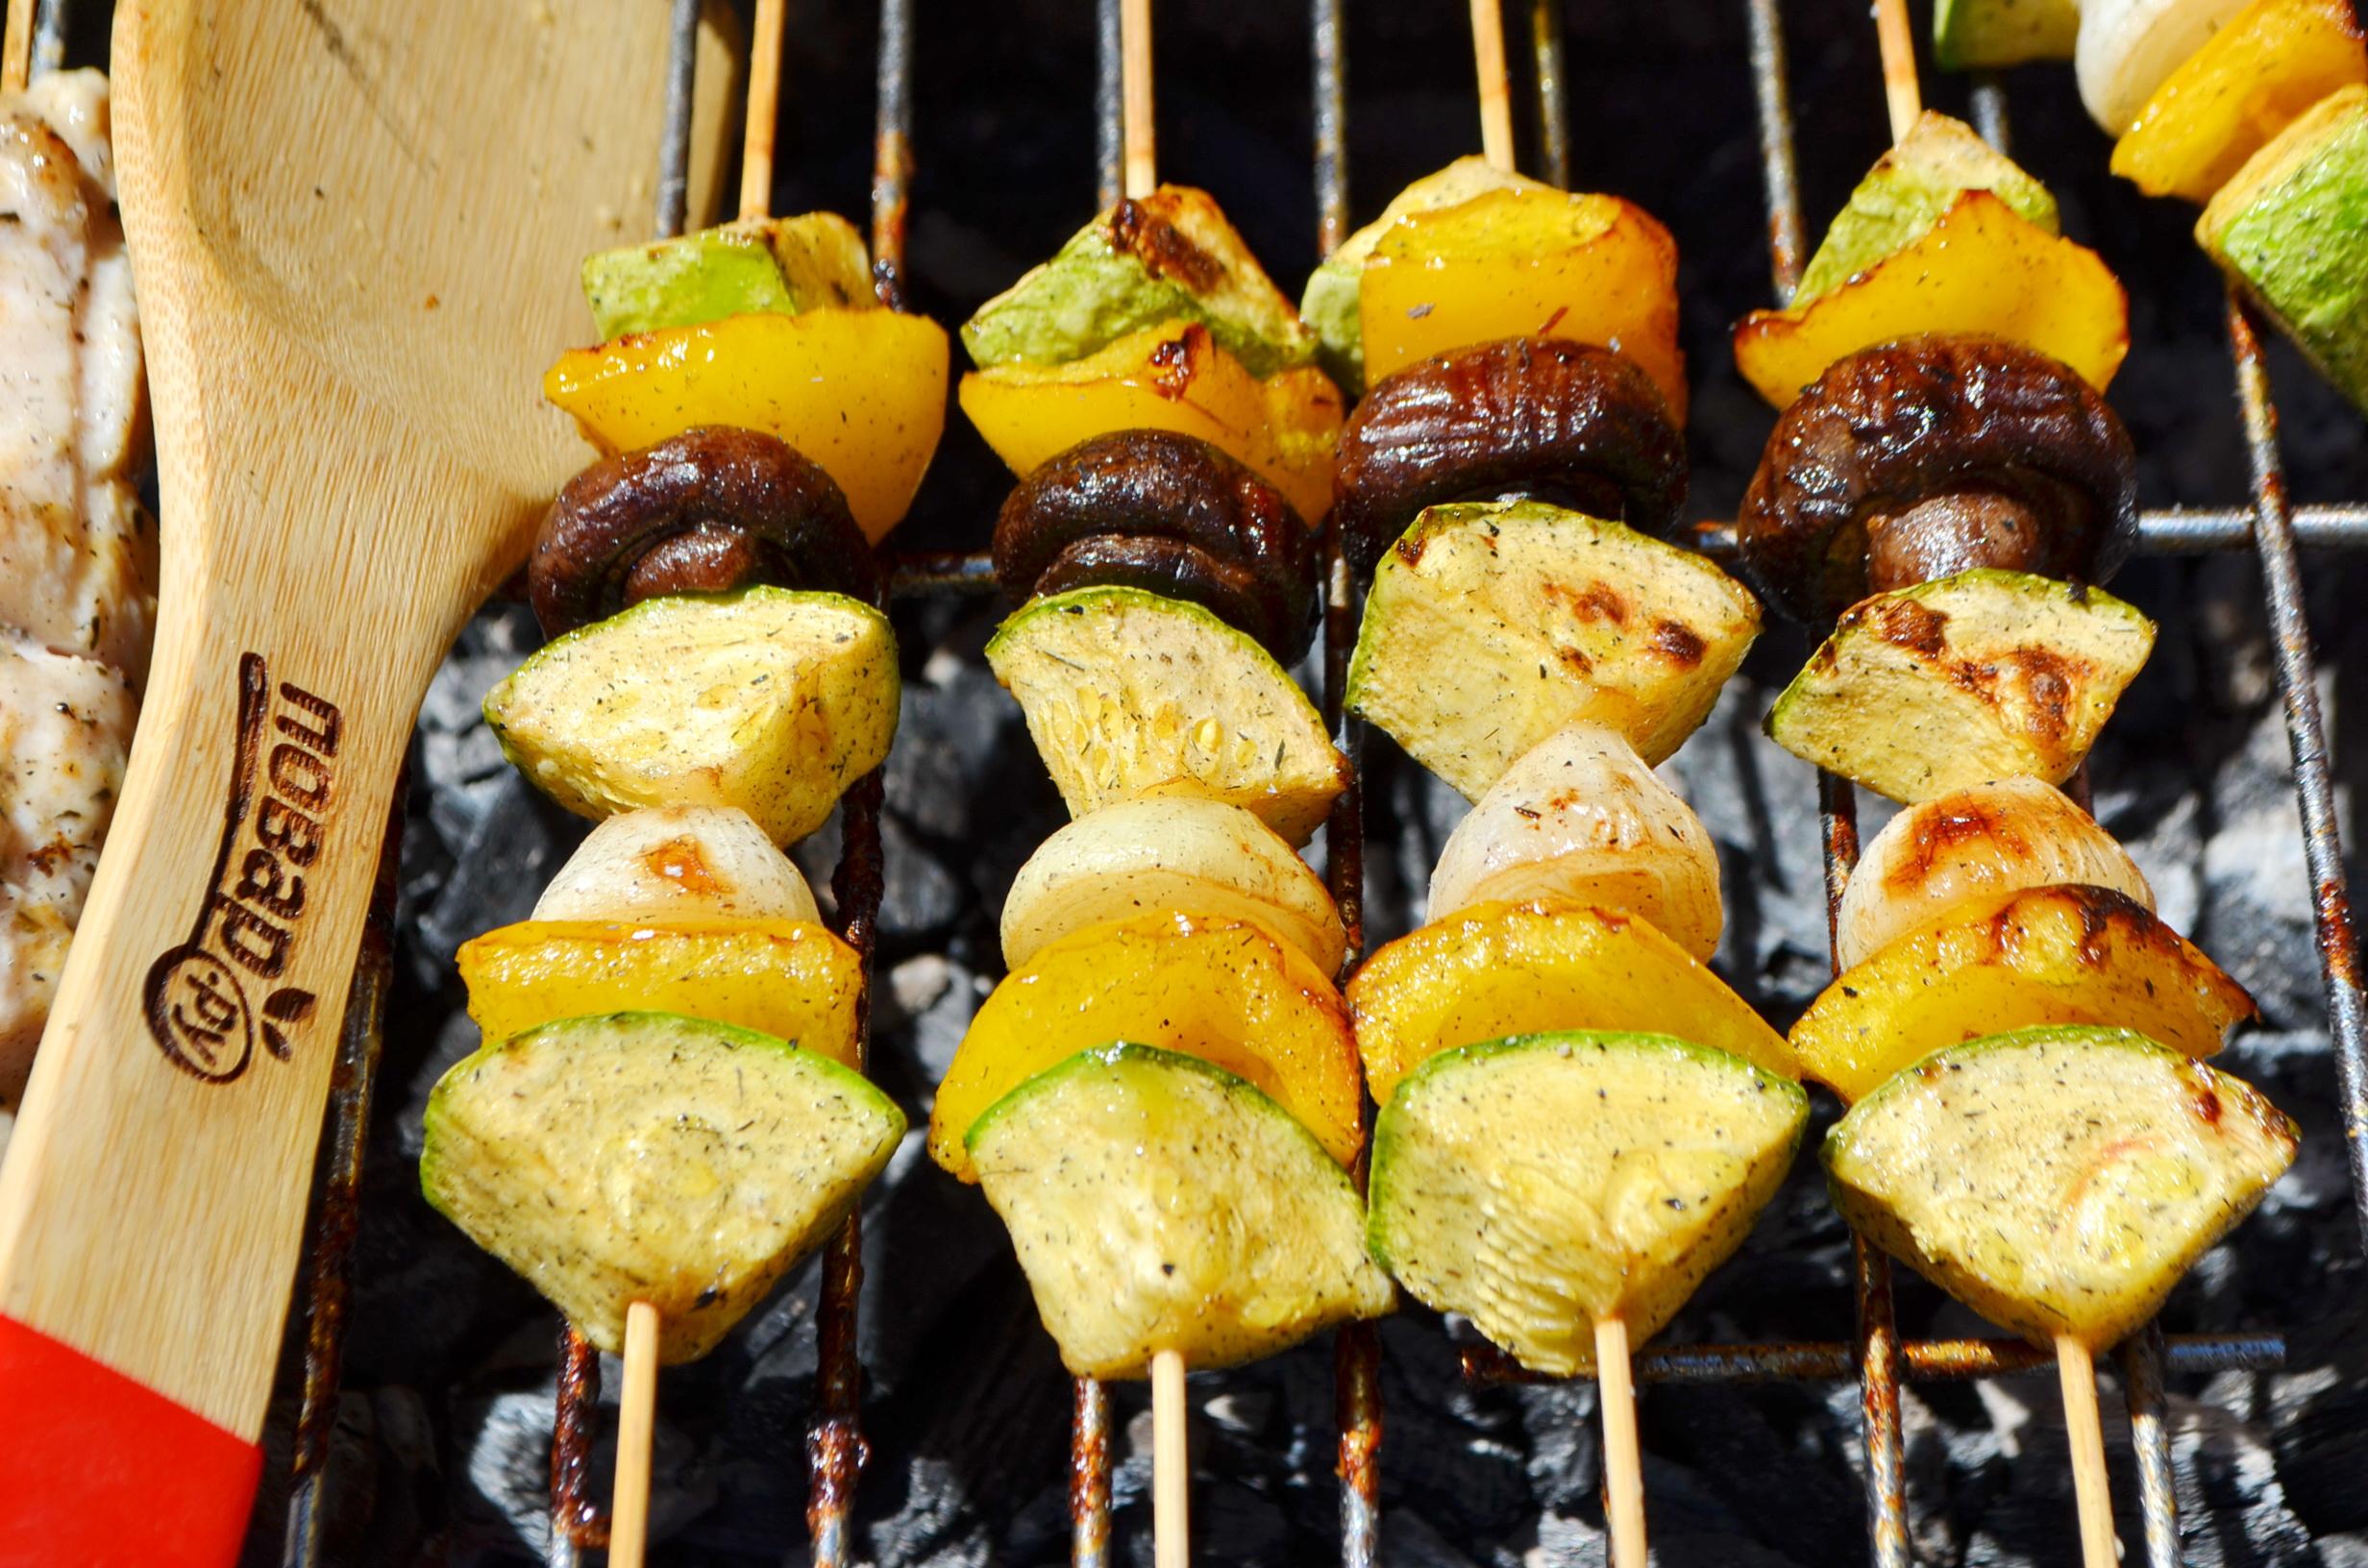 Овощи на гриле, шаг 5: жарьте овощи на гриле 15 минут